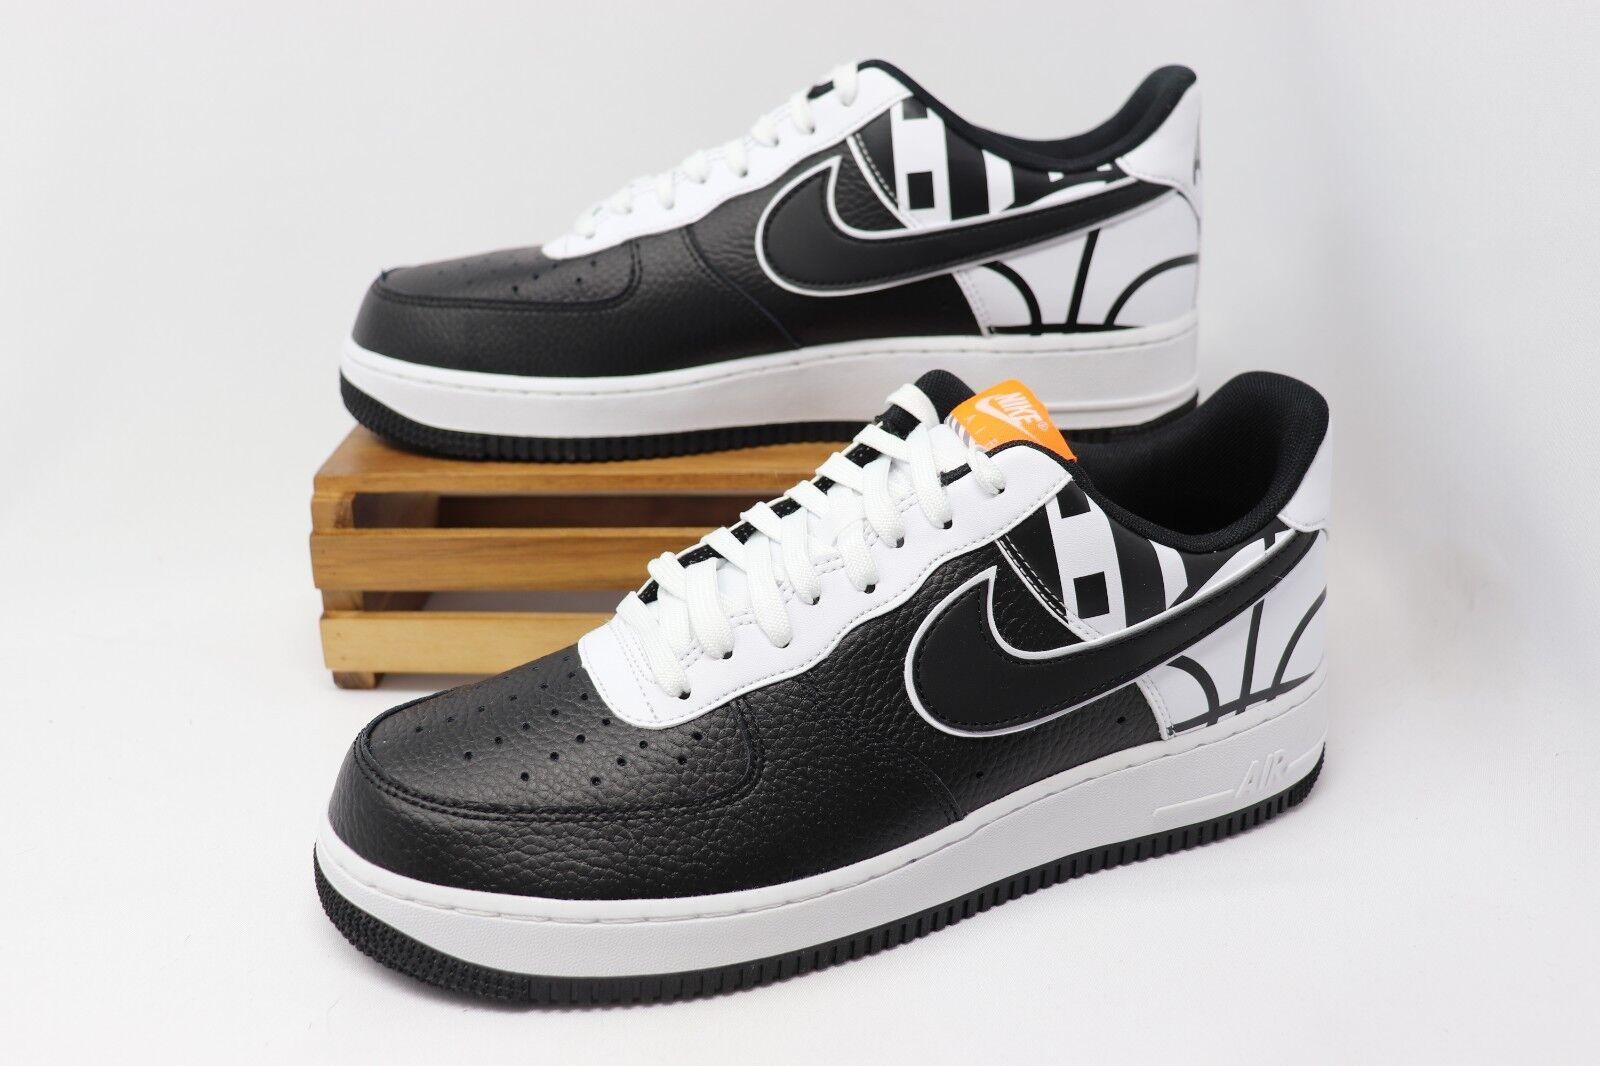 Nike air force 1 niedrige nba - kraft - - - logo - schwarz - weiße 823511-011 männer größe 13 neue 87e30e